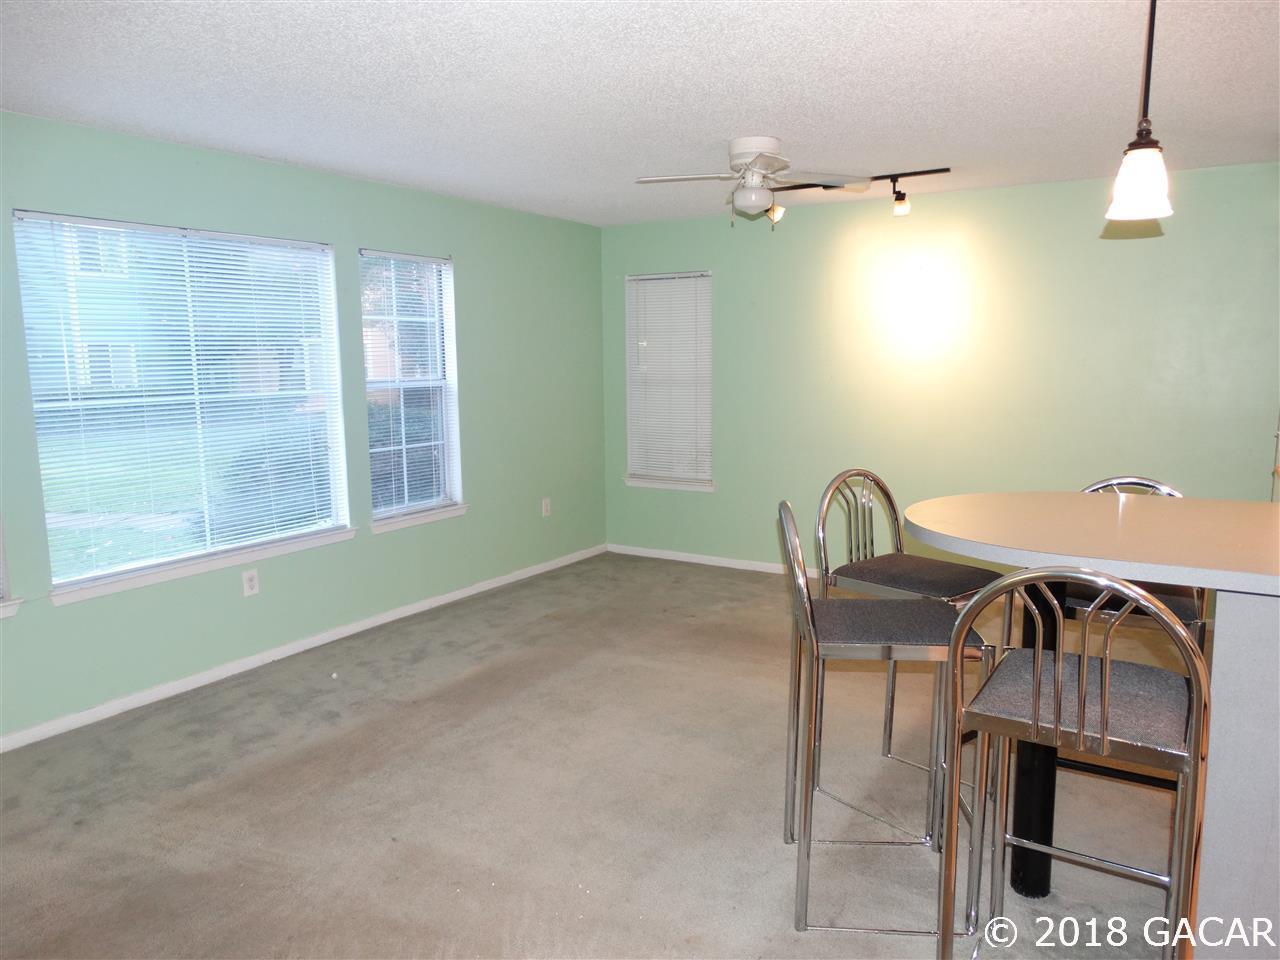 Listing: 2601 SW Archer Road #L-148, Gainesville, FL.| MLS# 415700 ...